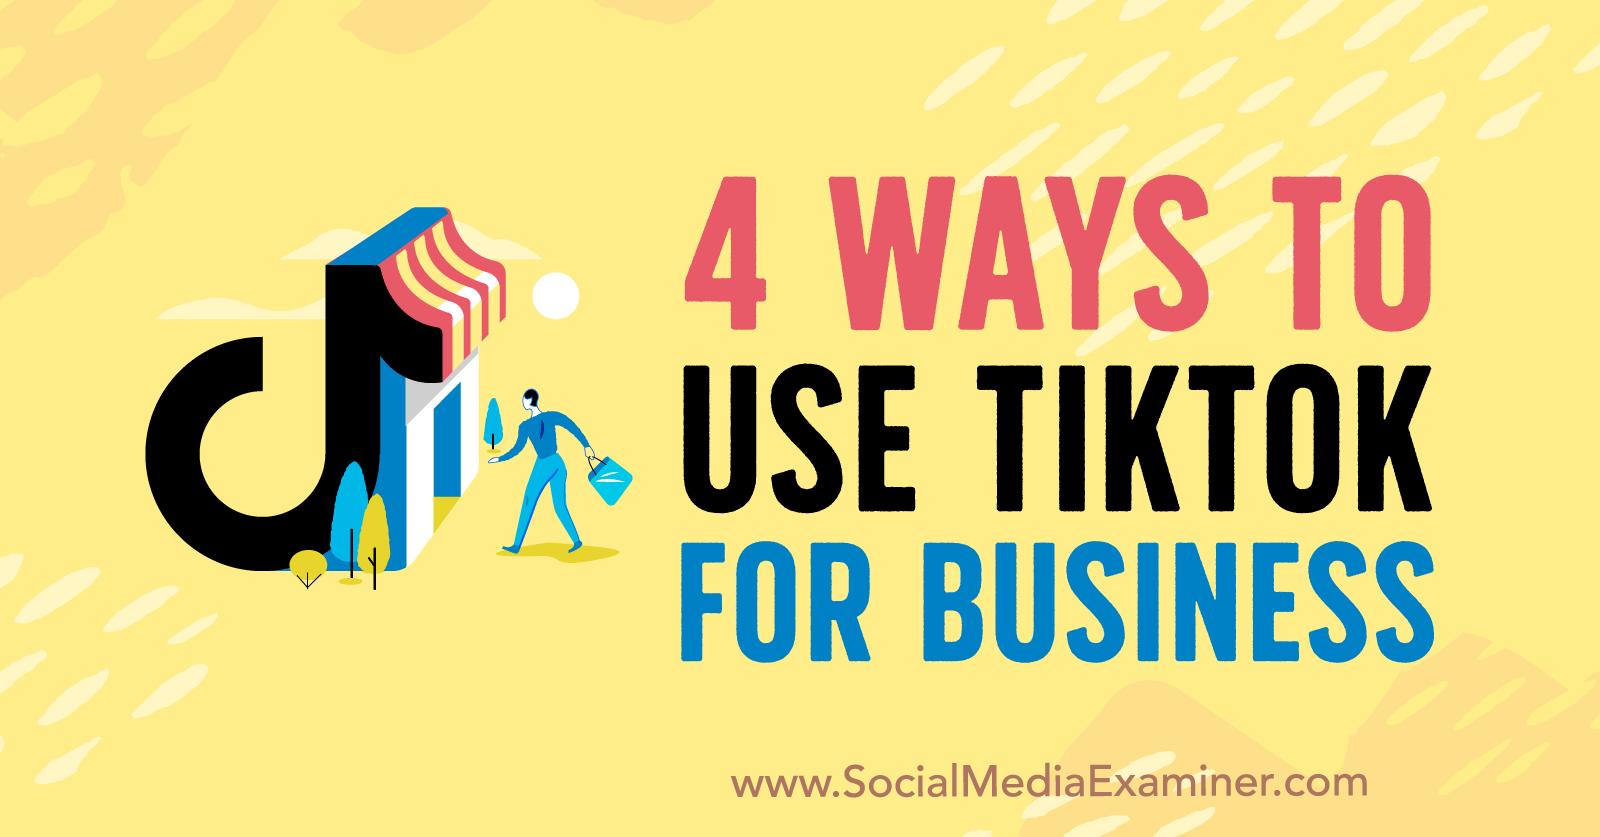 4 Ways to Use TikTok for Business : Social Media Examiner